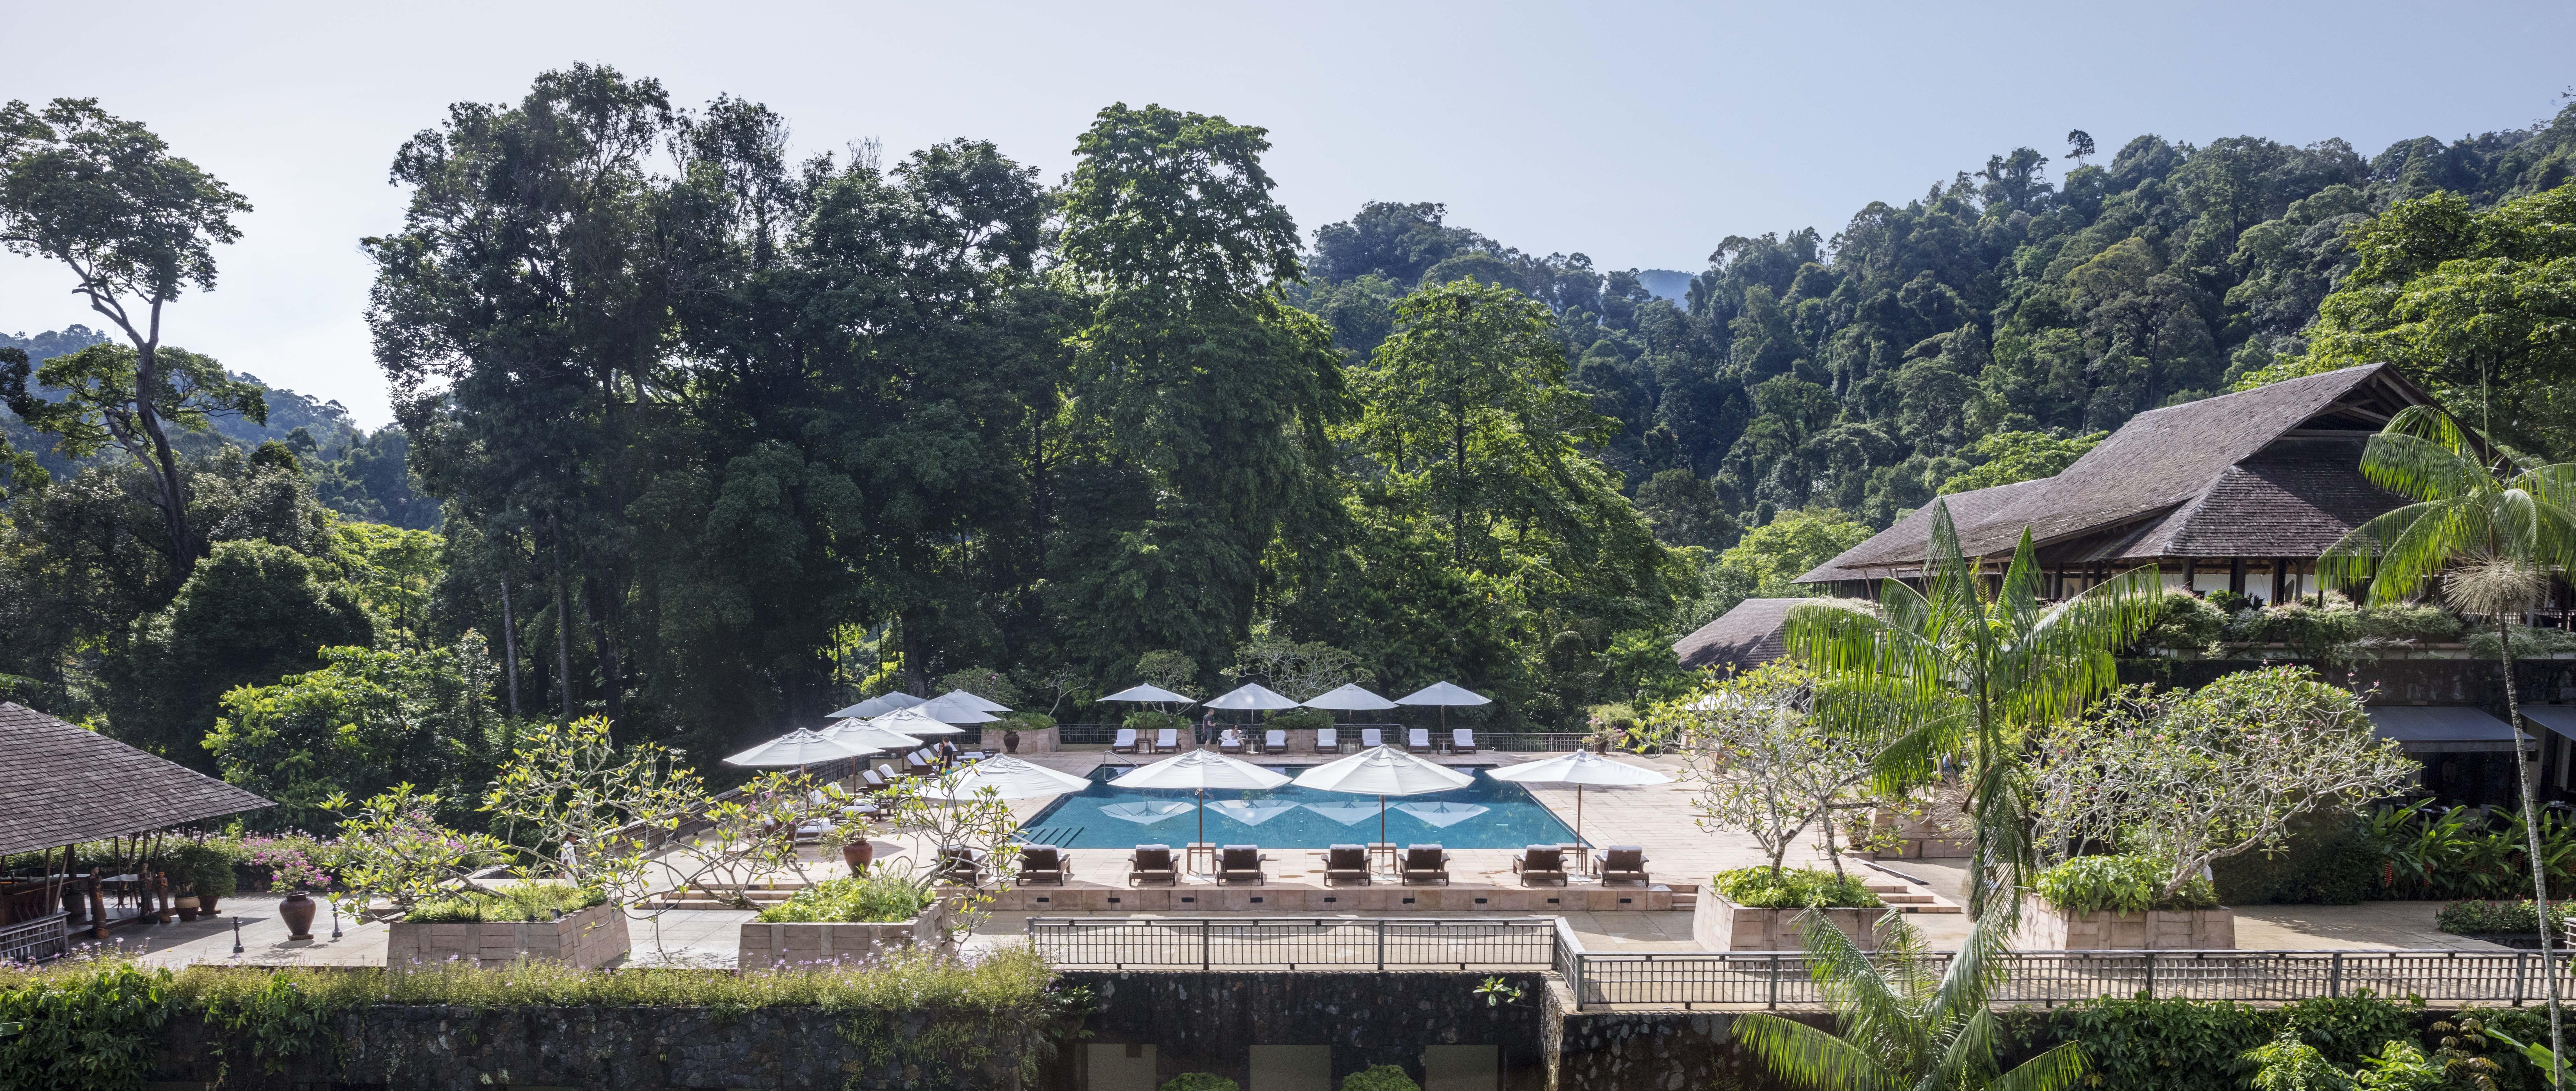 datai-swimming-pool